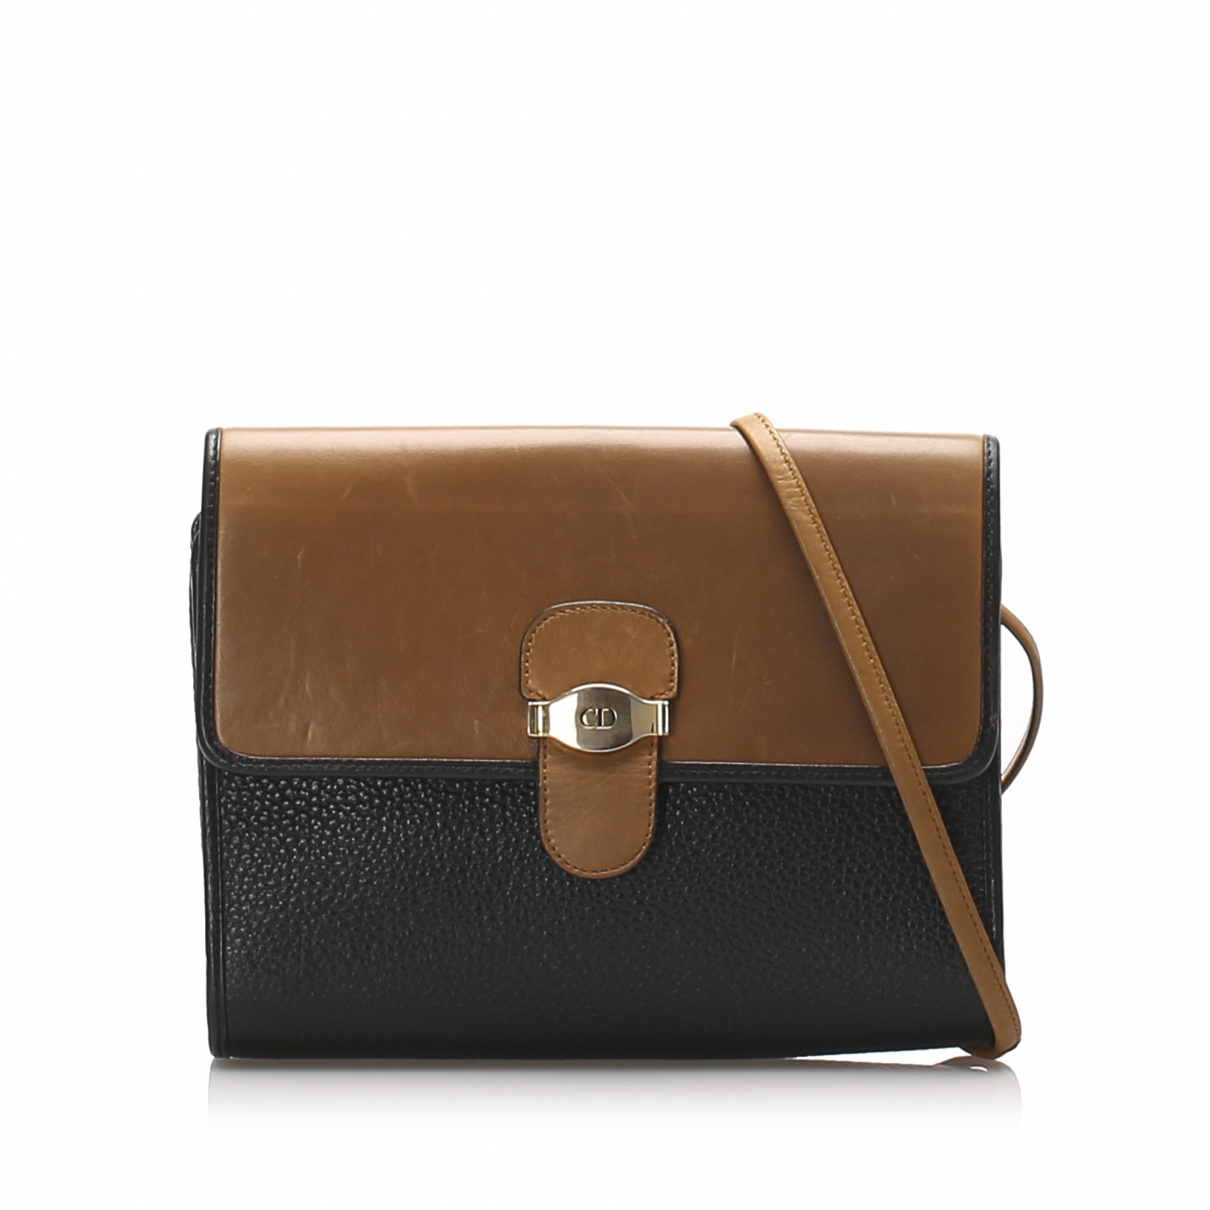 Dior N Blue Leather handbag for Women N